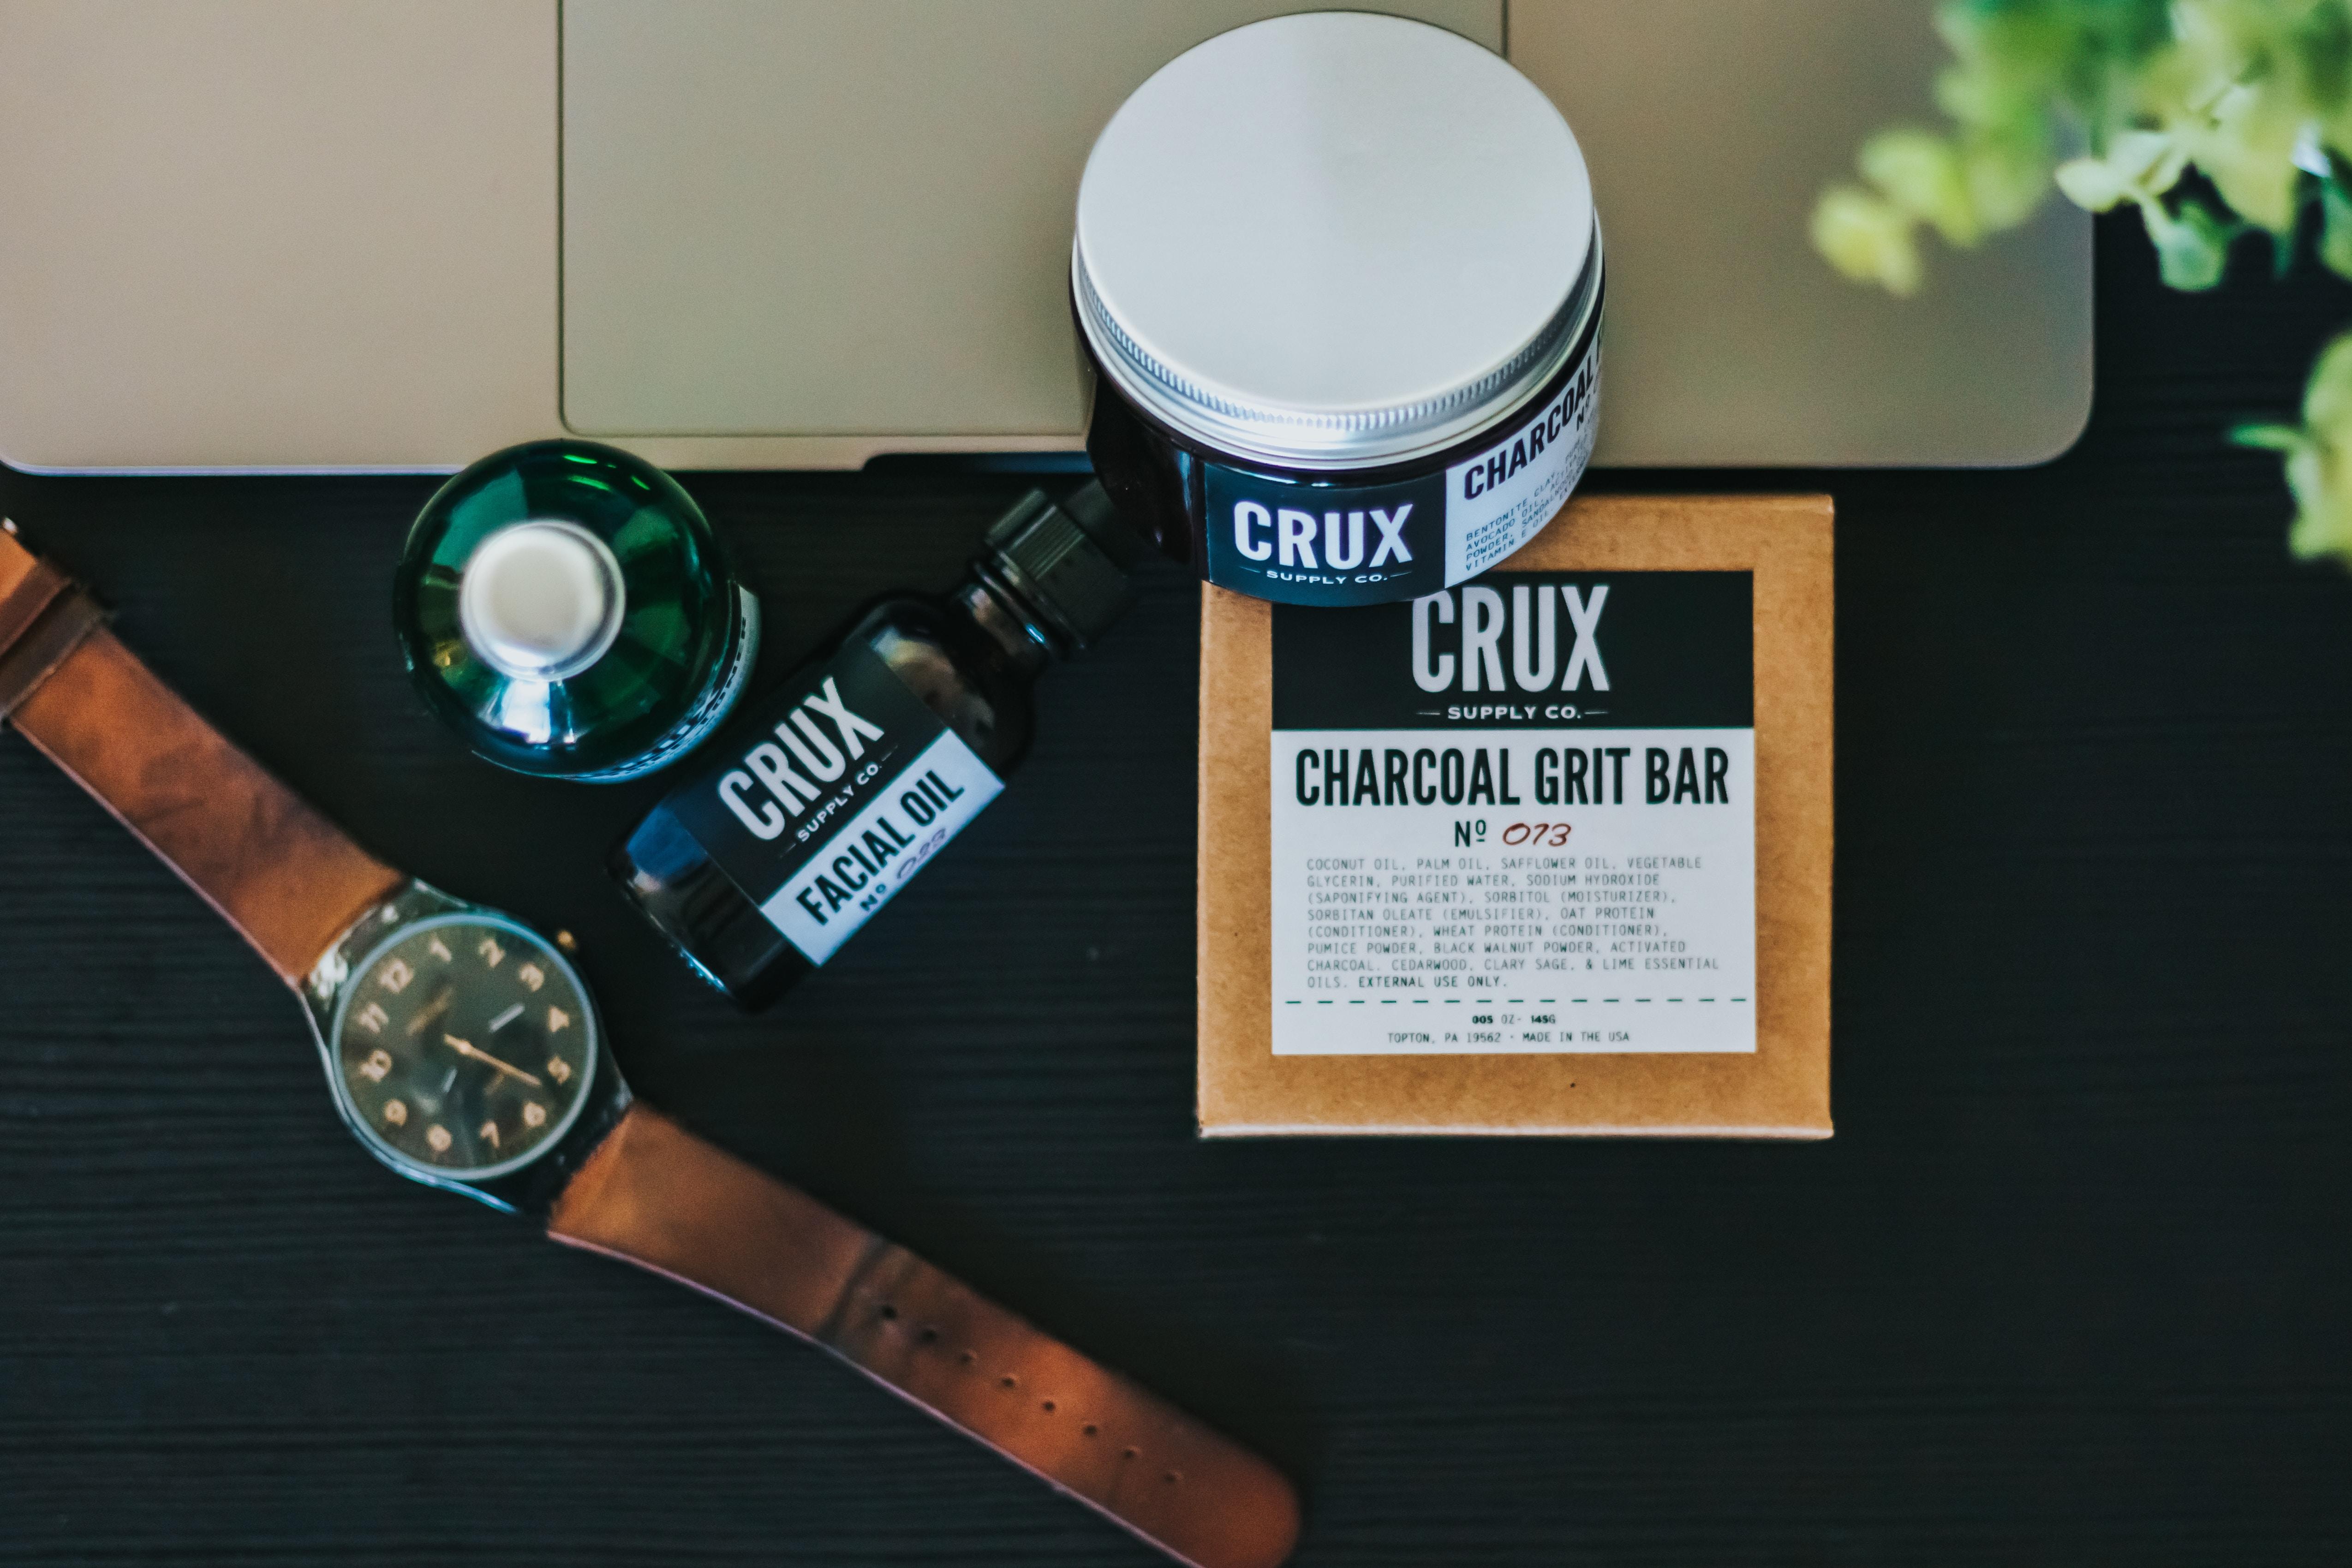 Crux charcoal grit bar